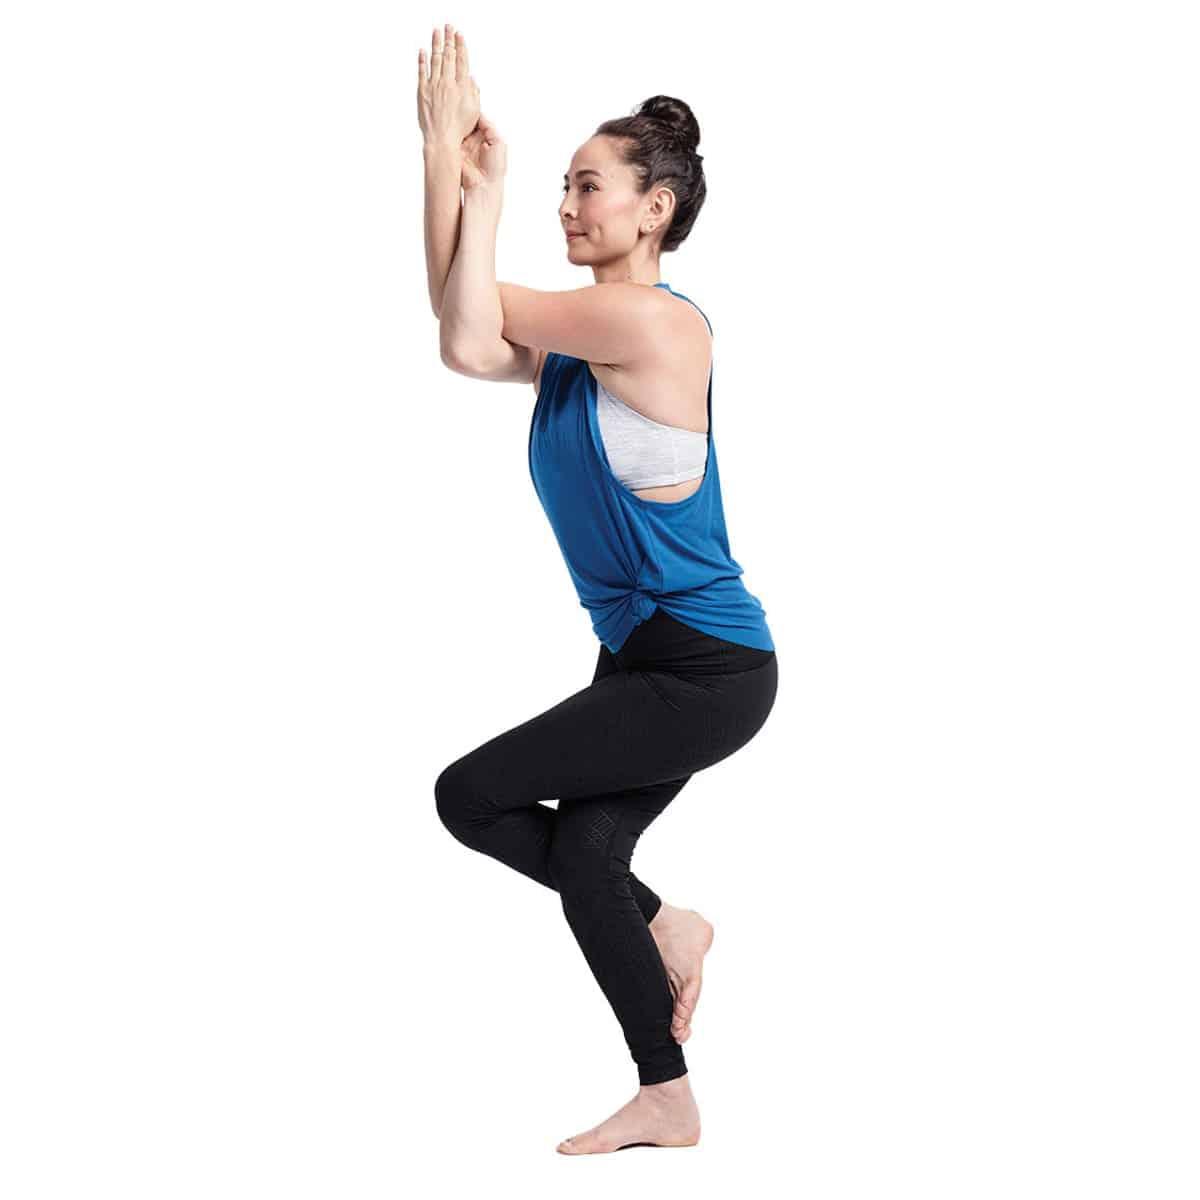 Yoga asanas 1- Garudasana